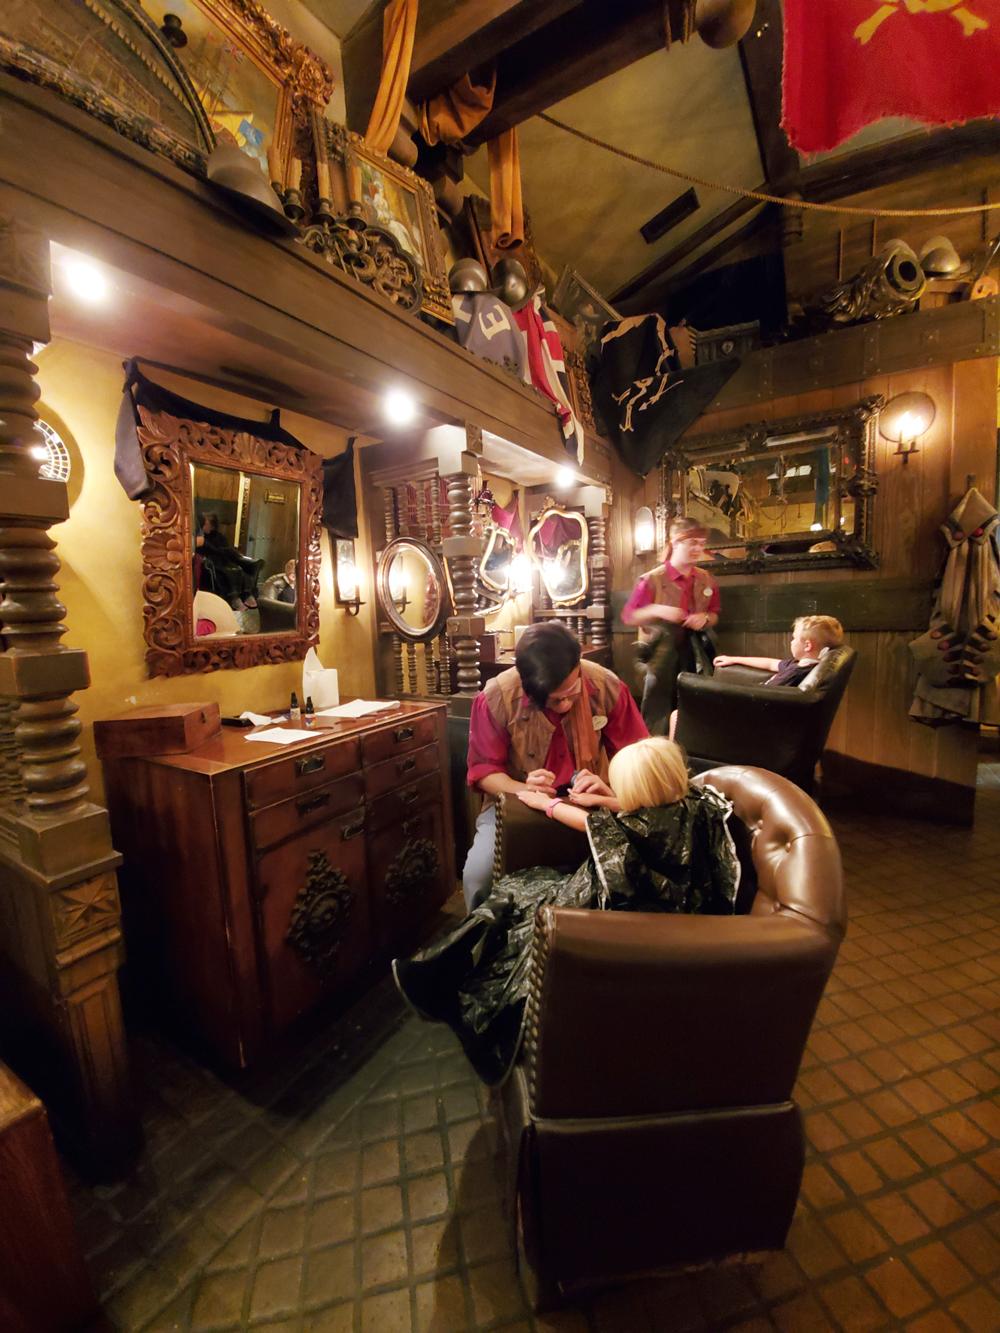 Inside the Pirates League at Magic Kingdom in Disney World